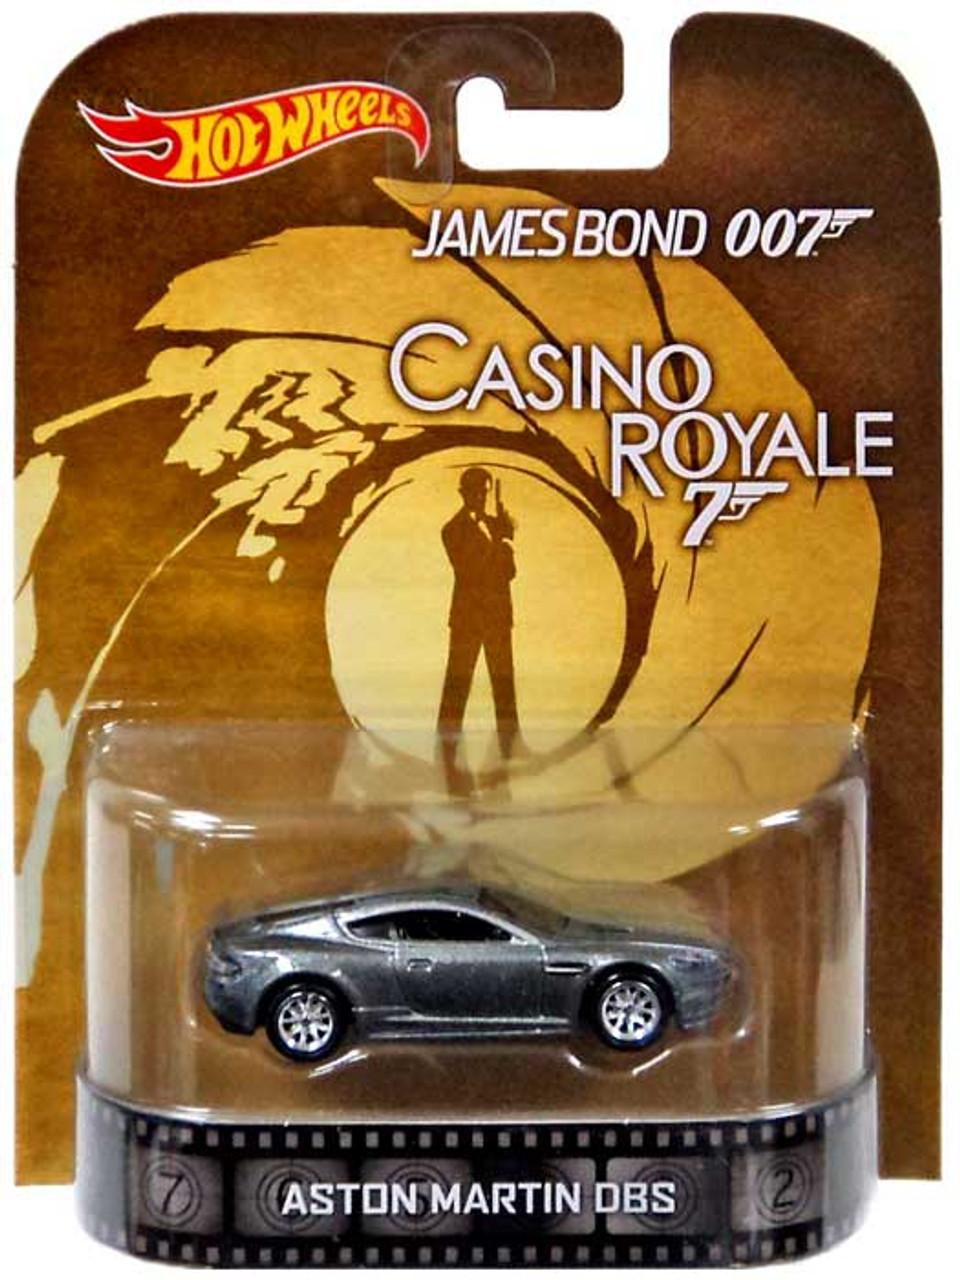 Hot Wheels James Bond Hw Retro Entertainment Aston Martin Dbs 164 Diecast Car Casino Royale Mattel Toys Toywiz